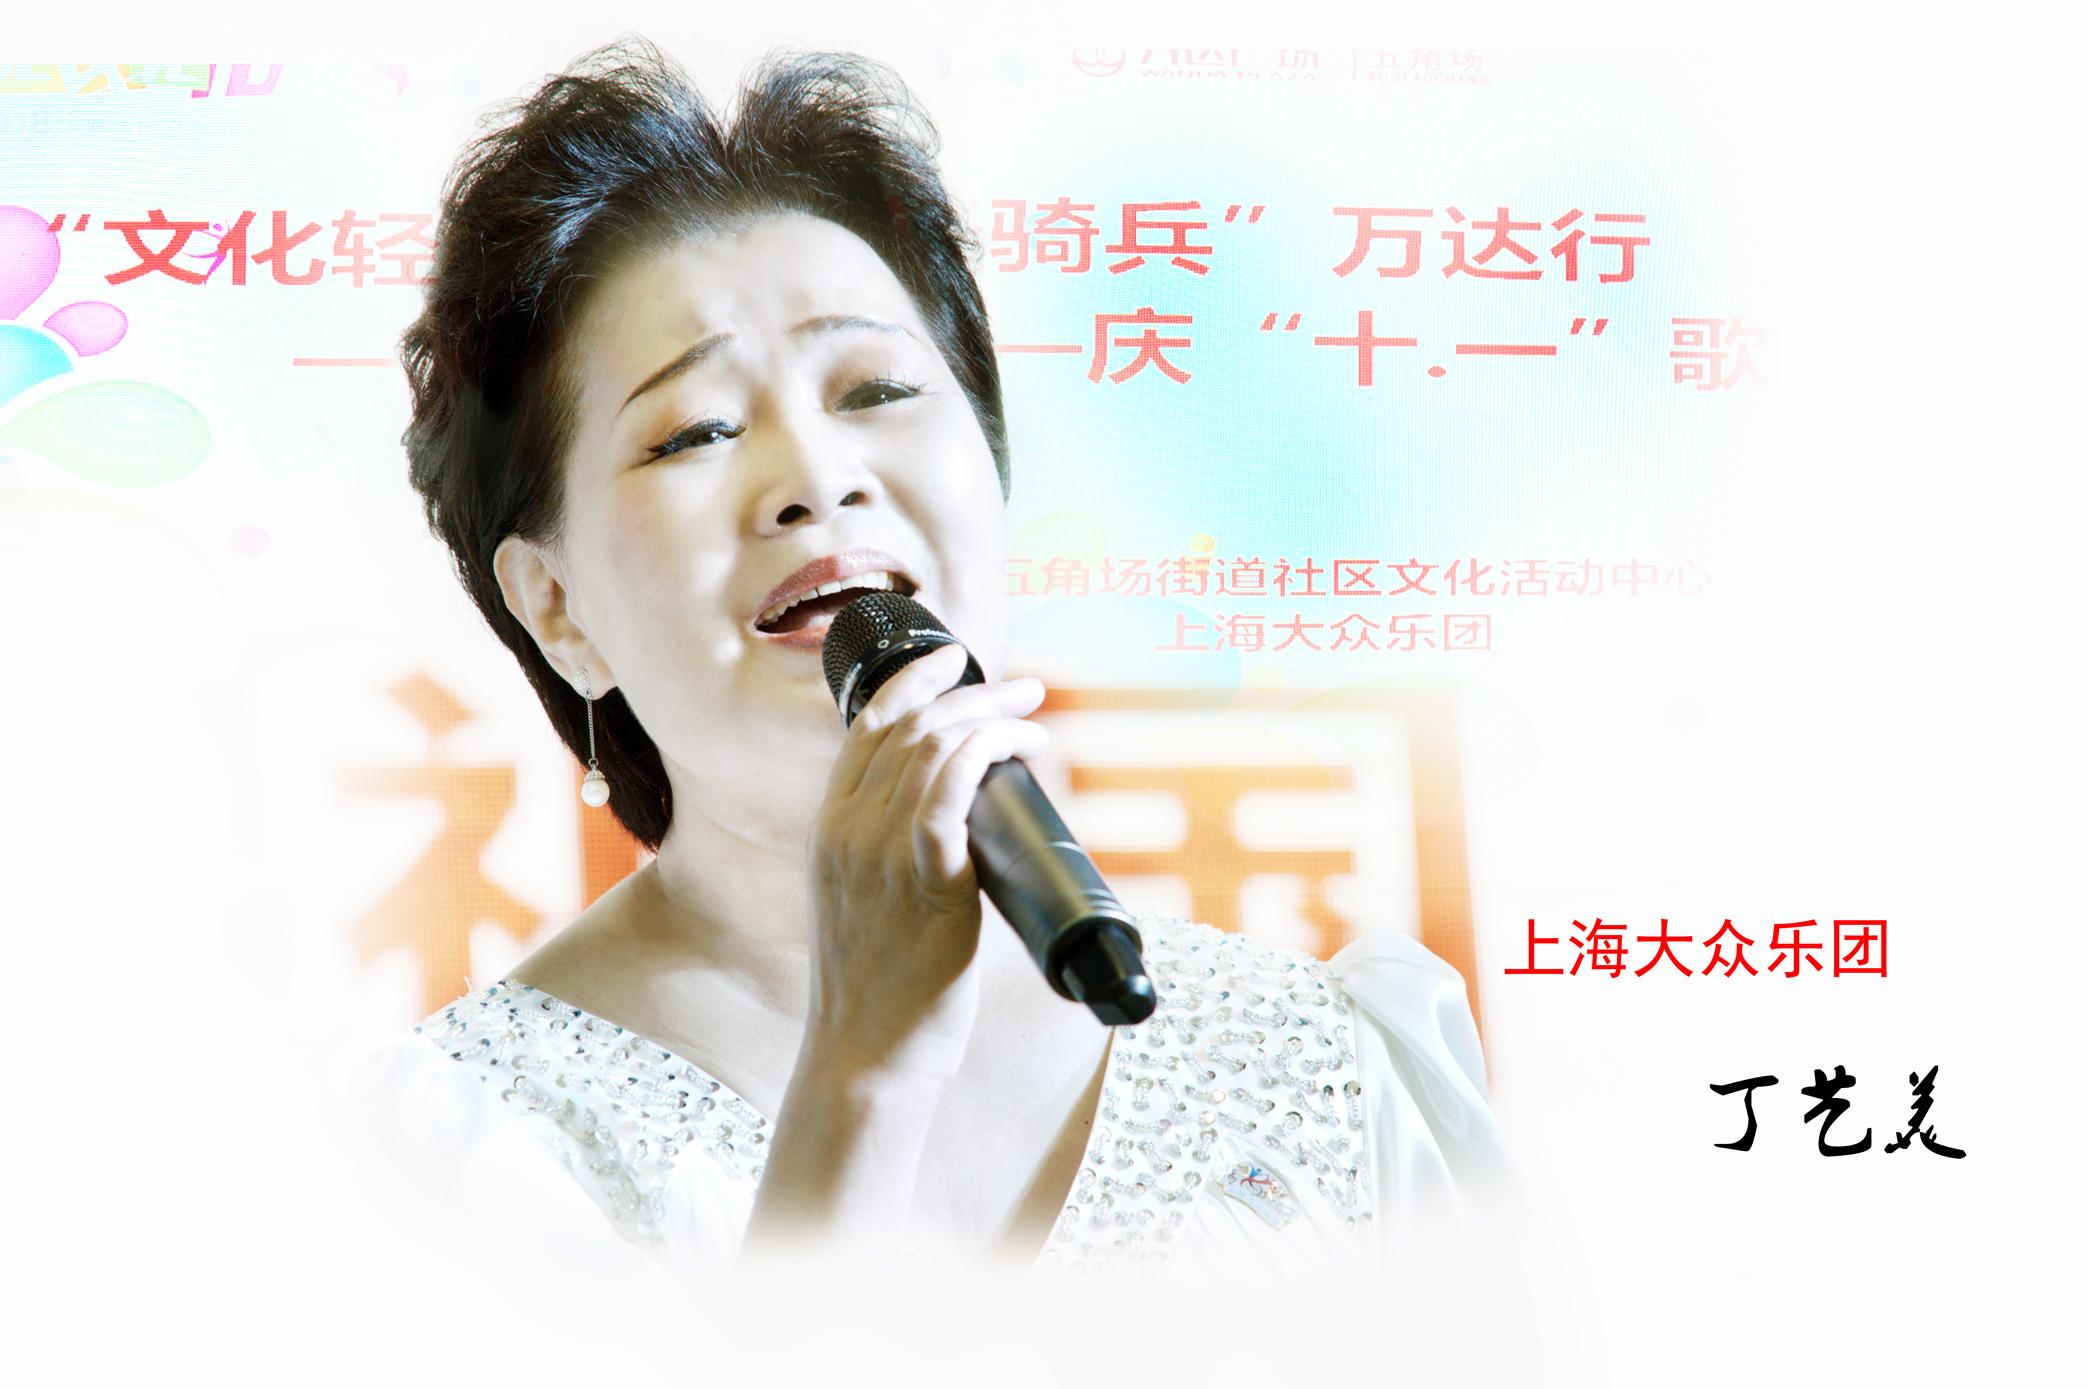 11dsc01946_ABC-.jpg